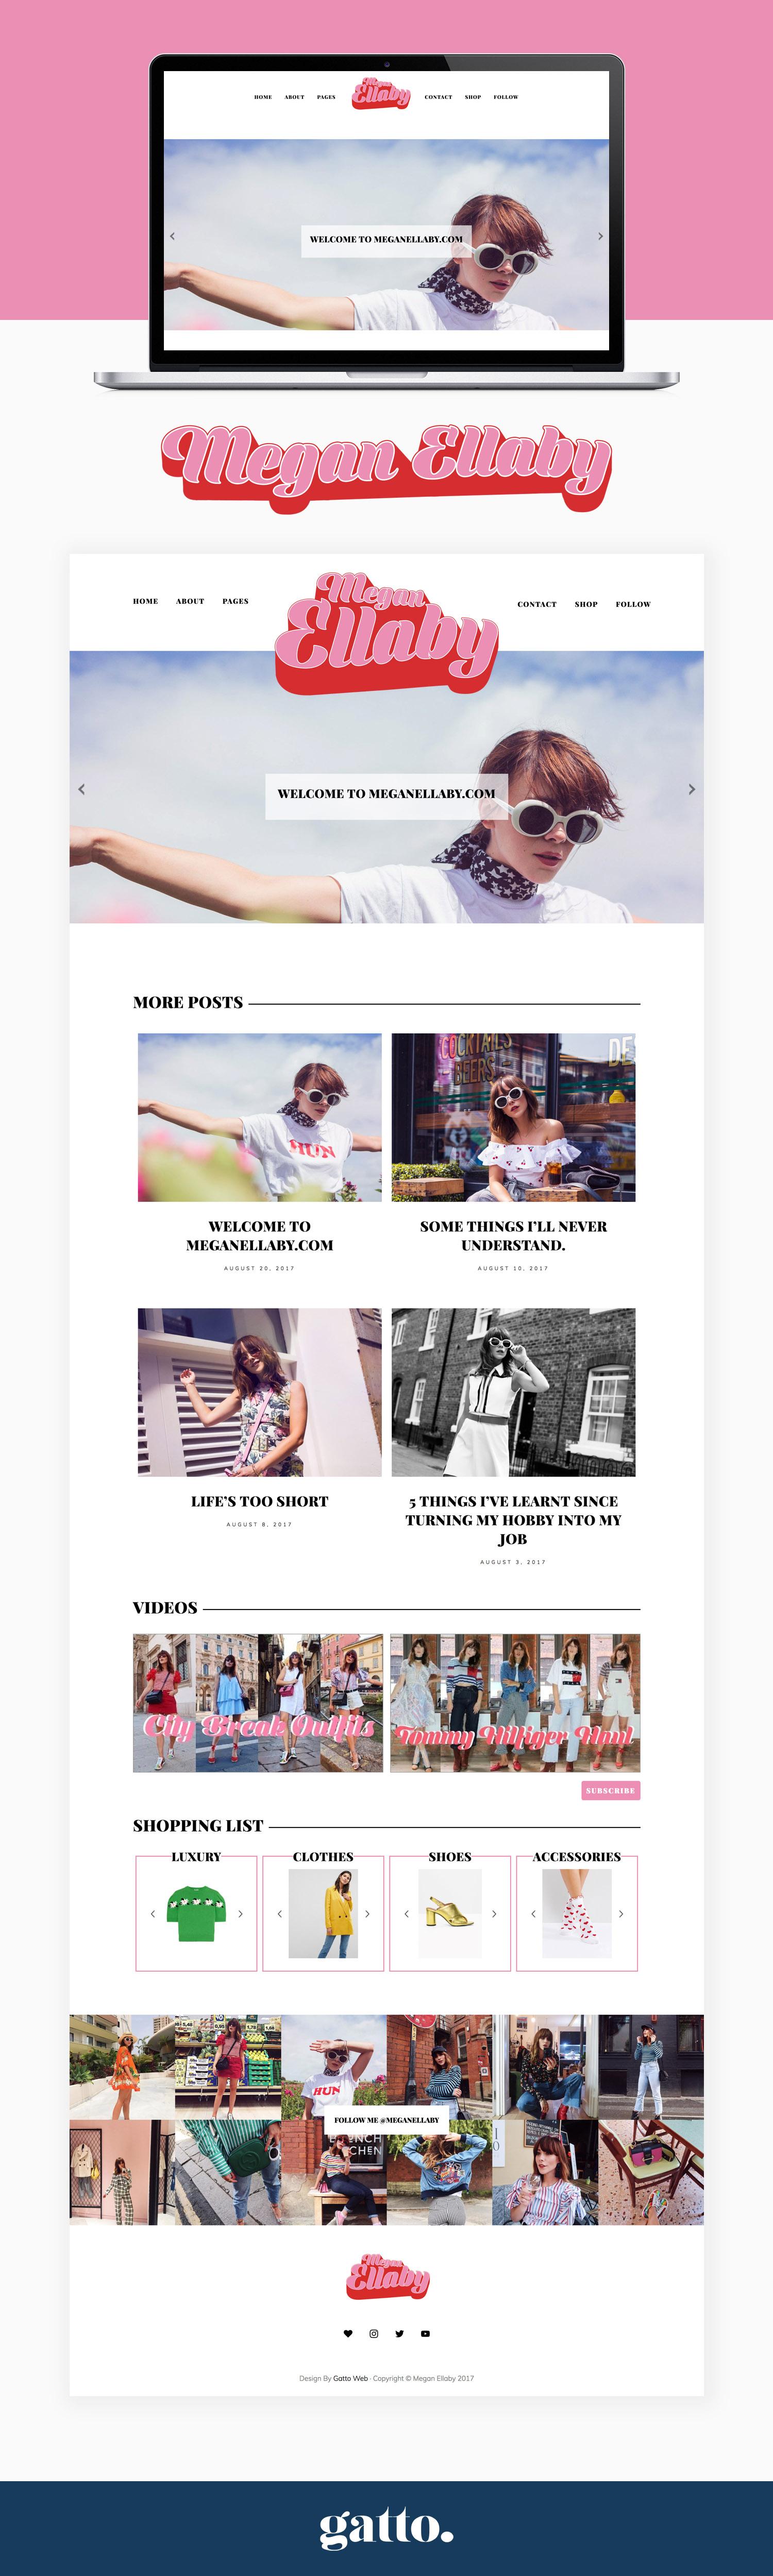 Megan Ellaby Website Design | Retro Blog Design | Unique colourful website | Gatto Branding and Web Design